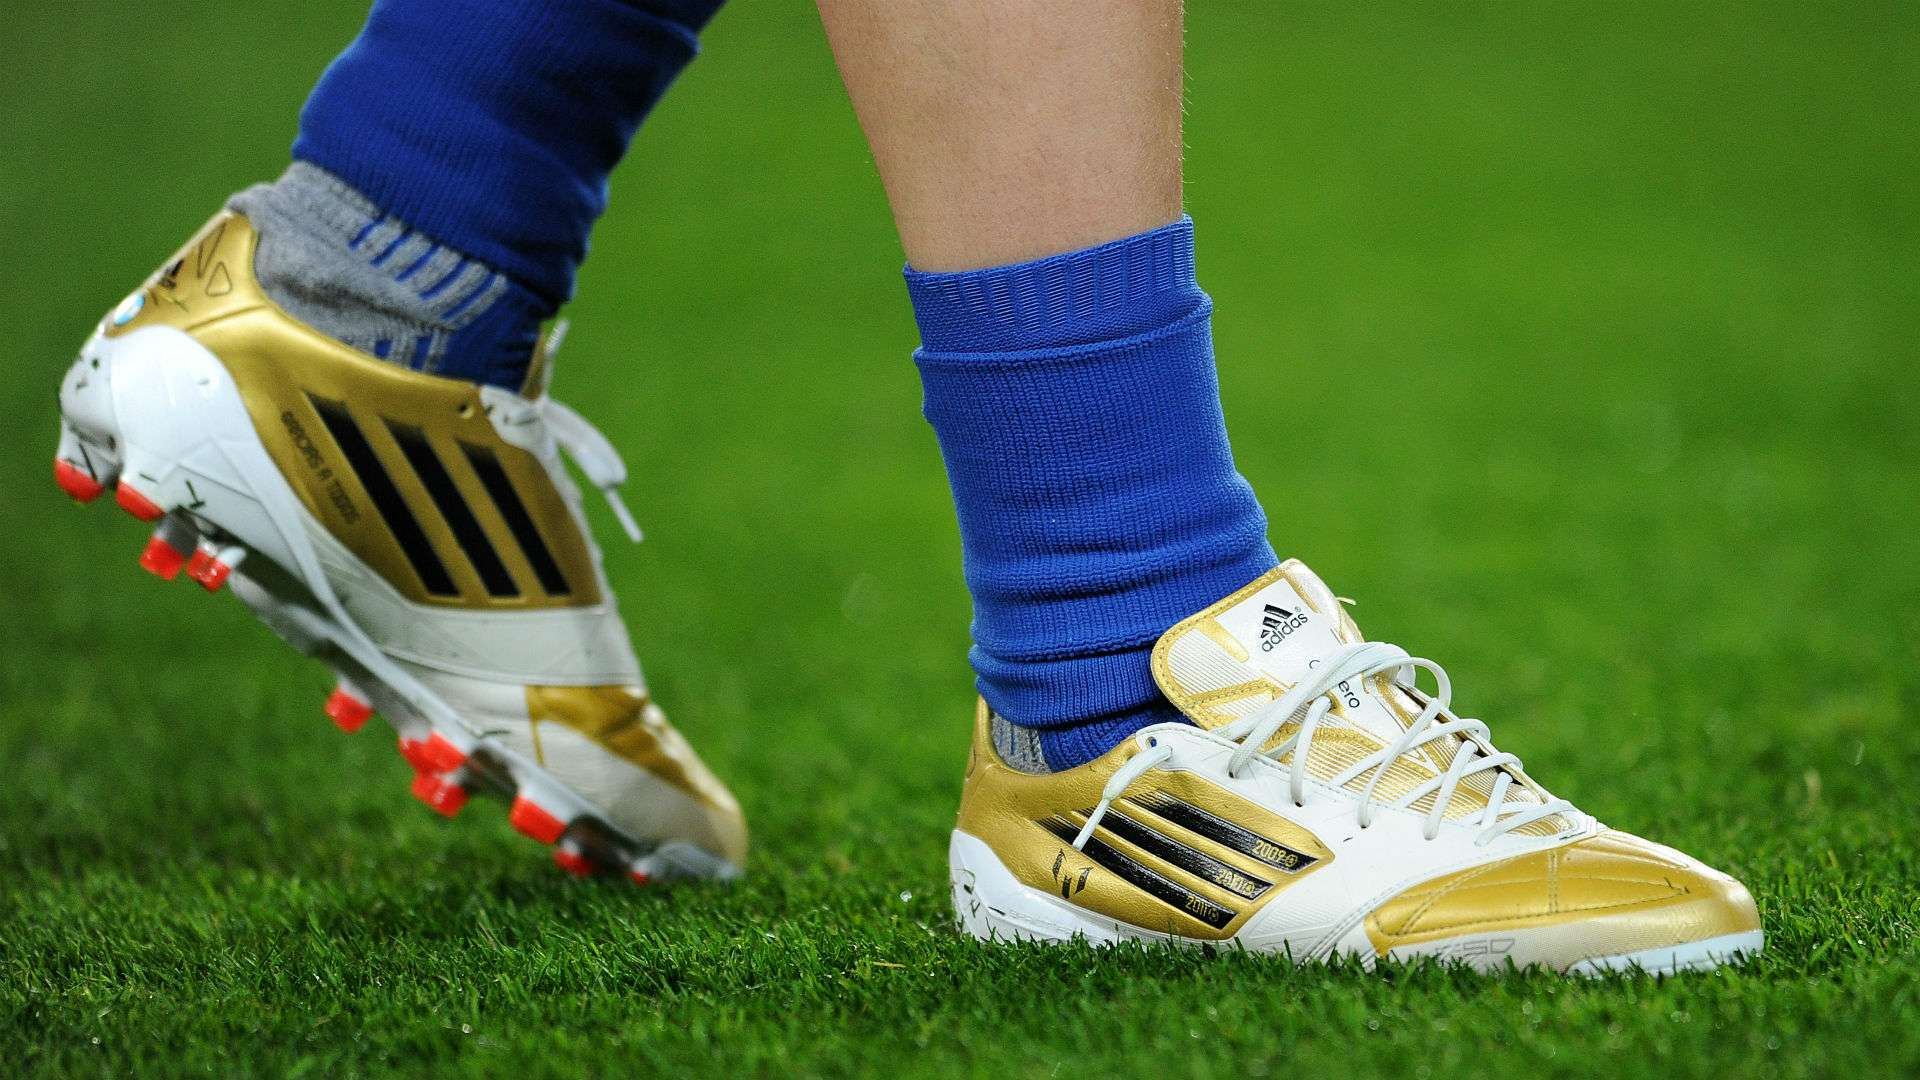 Ya dolor de cabeza Posteridad  Lionel Messi's boots - a history of the Barcelona & Argentina star's best  footwear | Goal.com